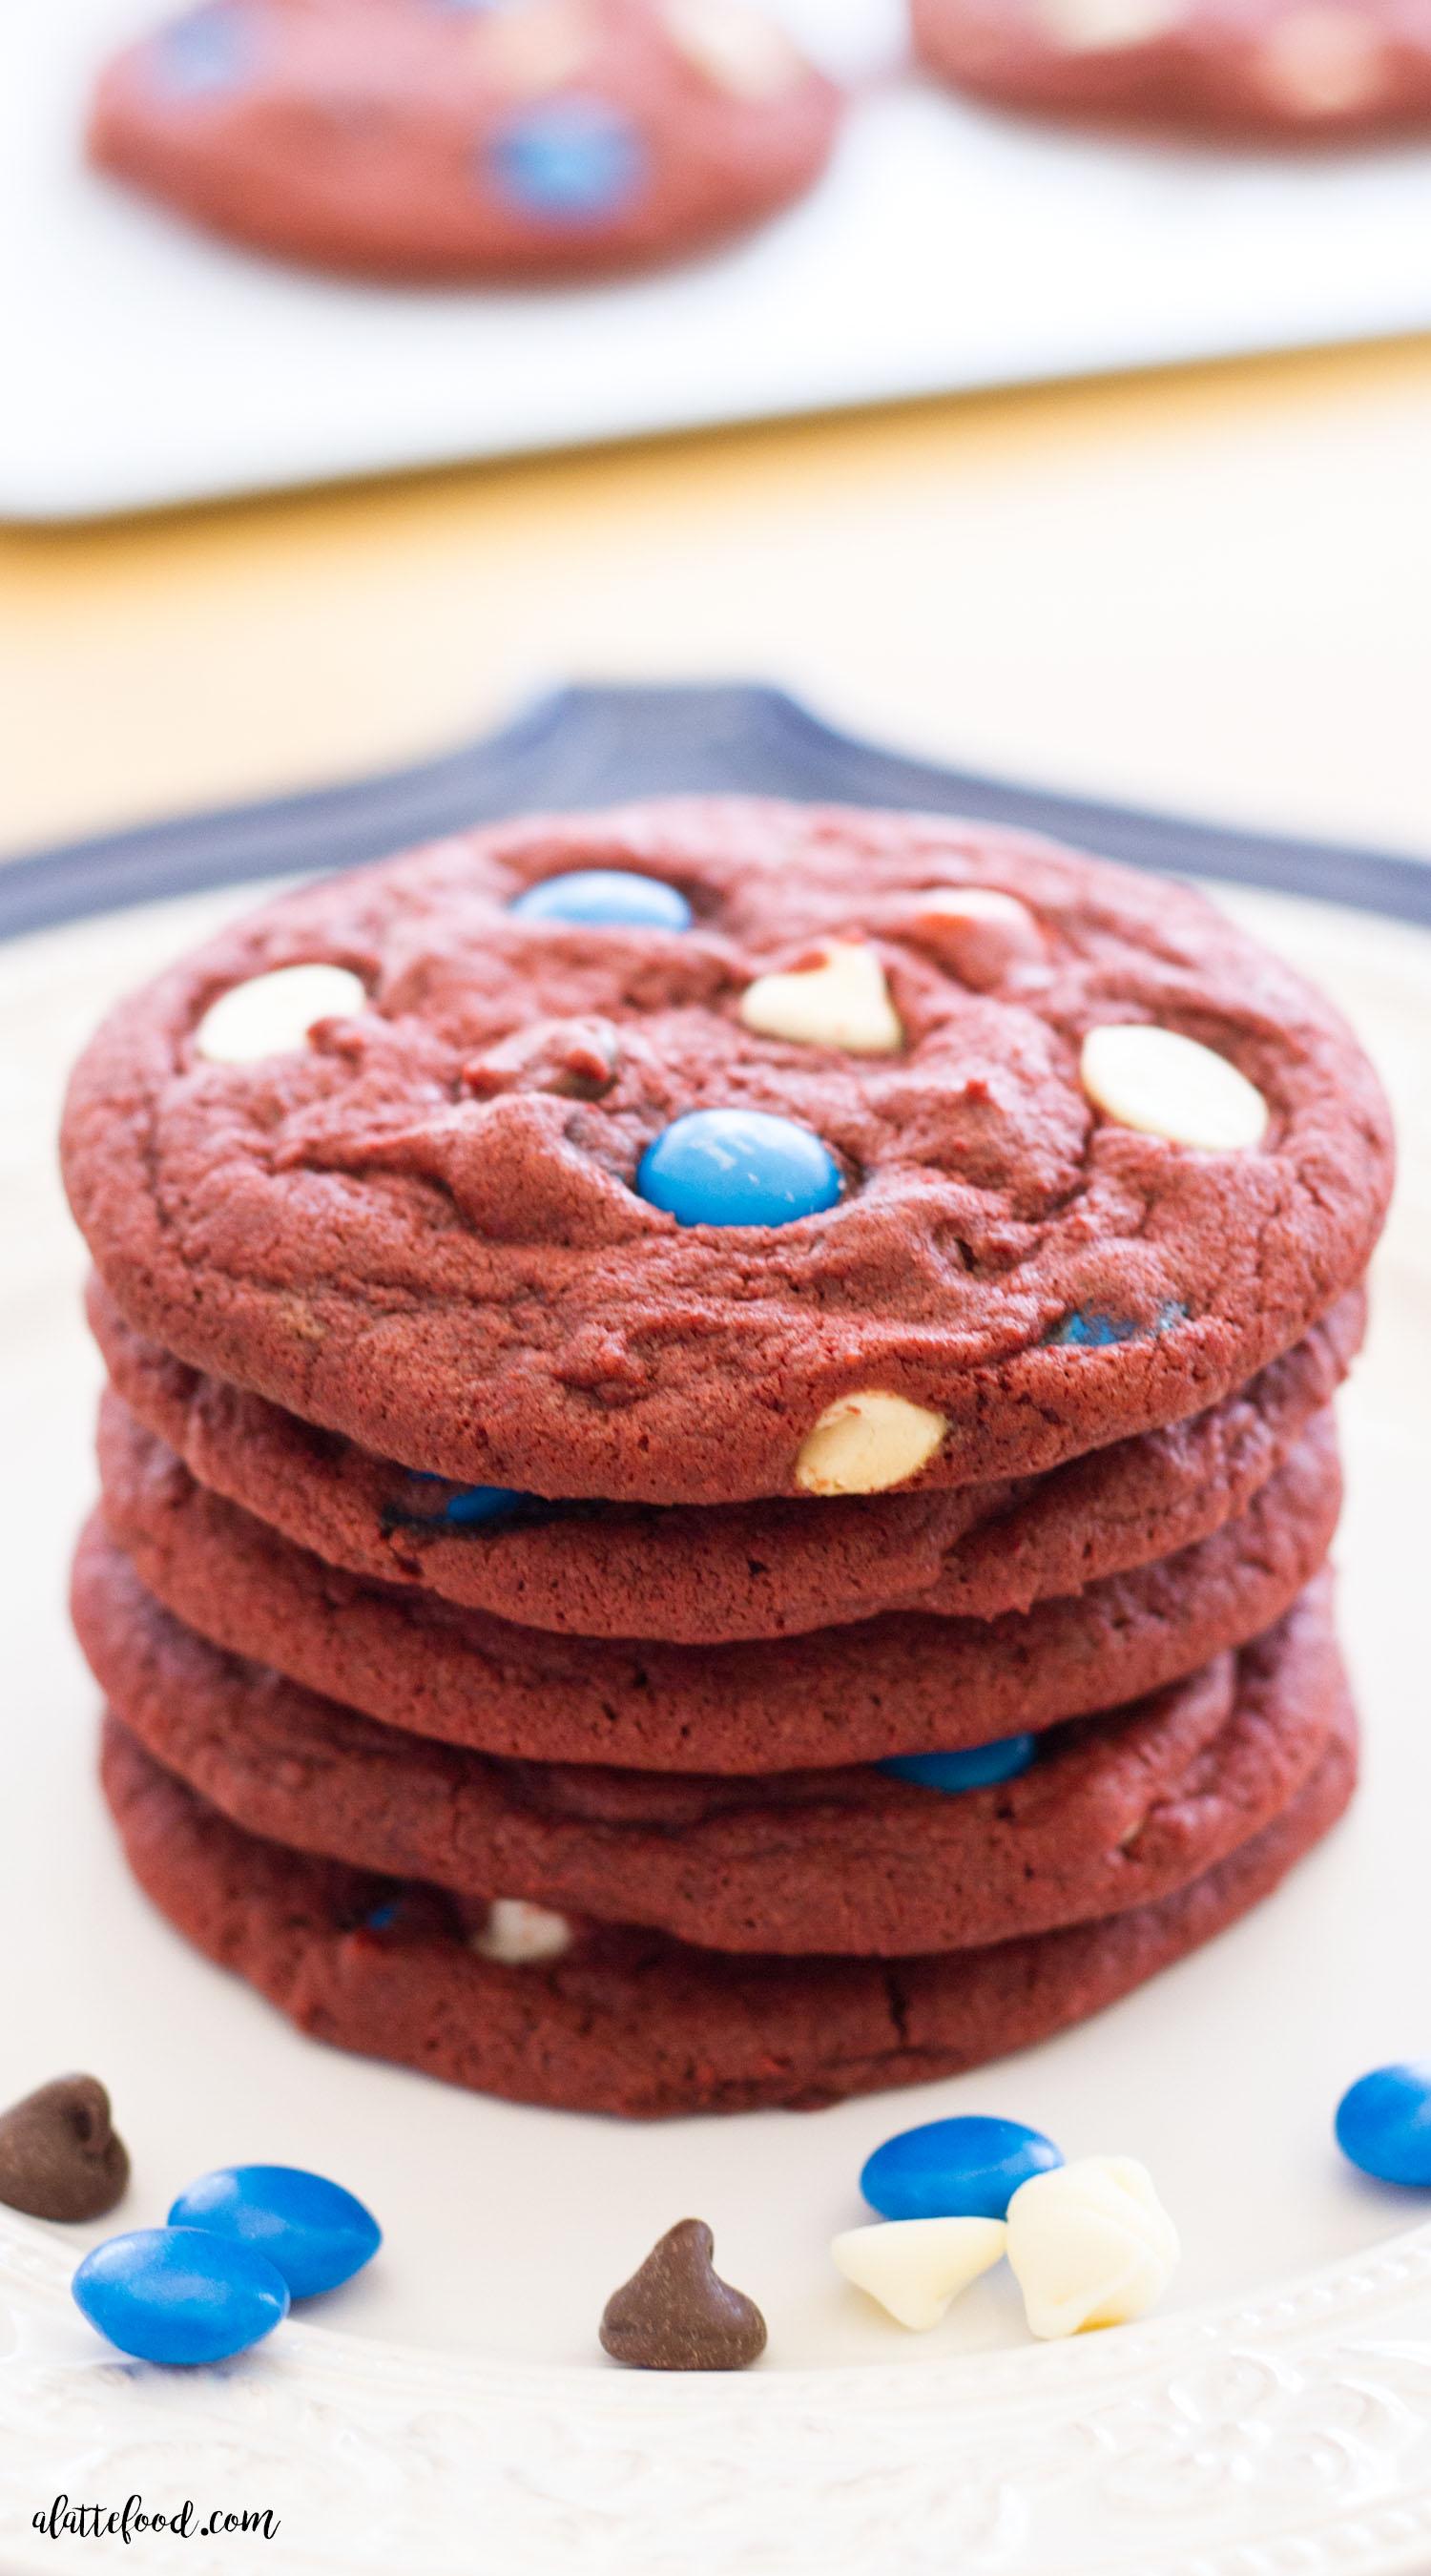 Cranberry Almond Bundt Cake · Red Velvet Chocolate Chip Cookies